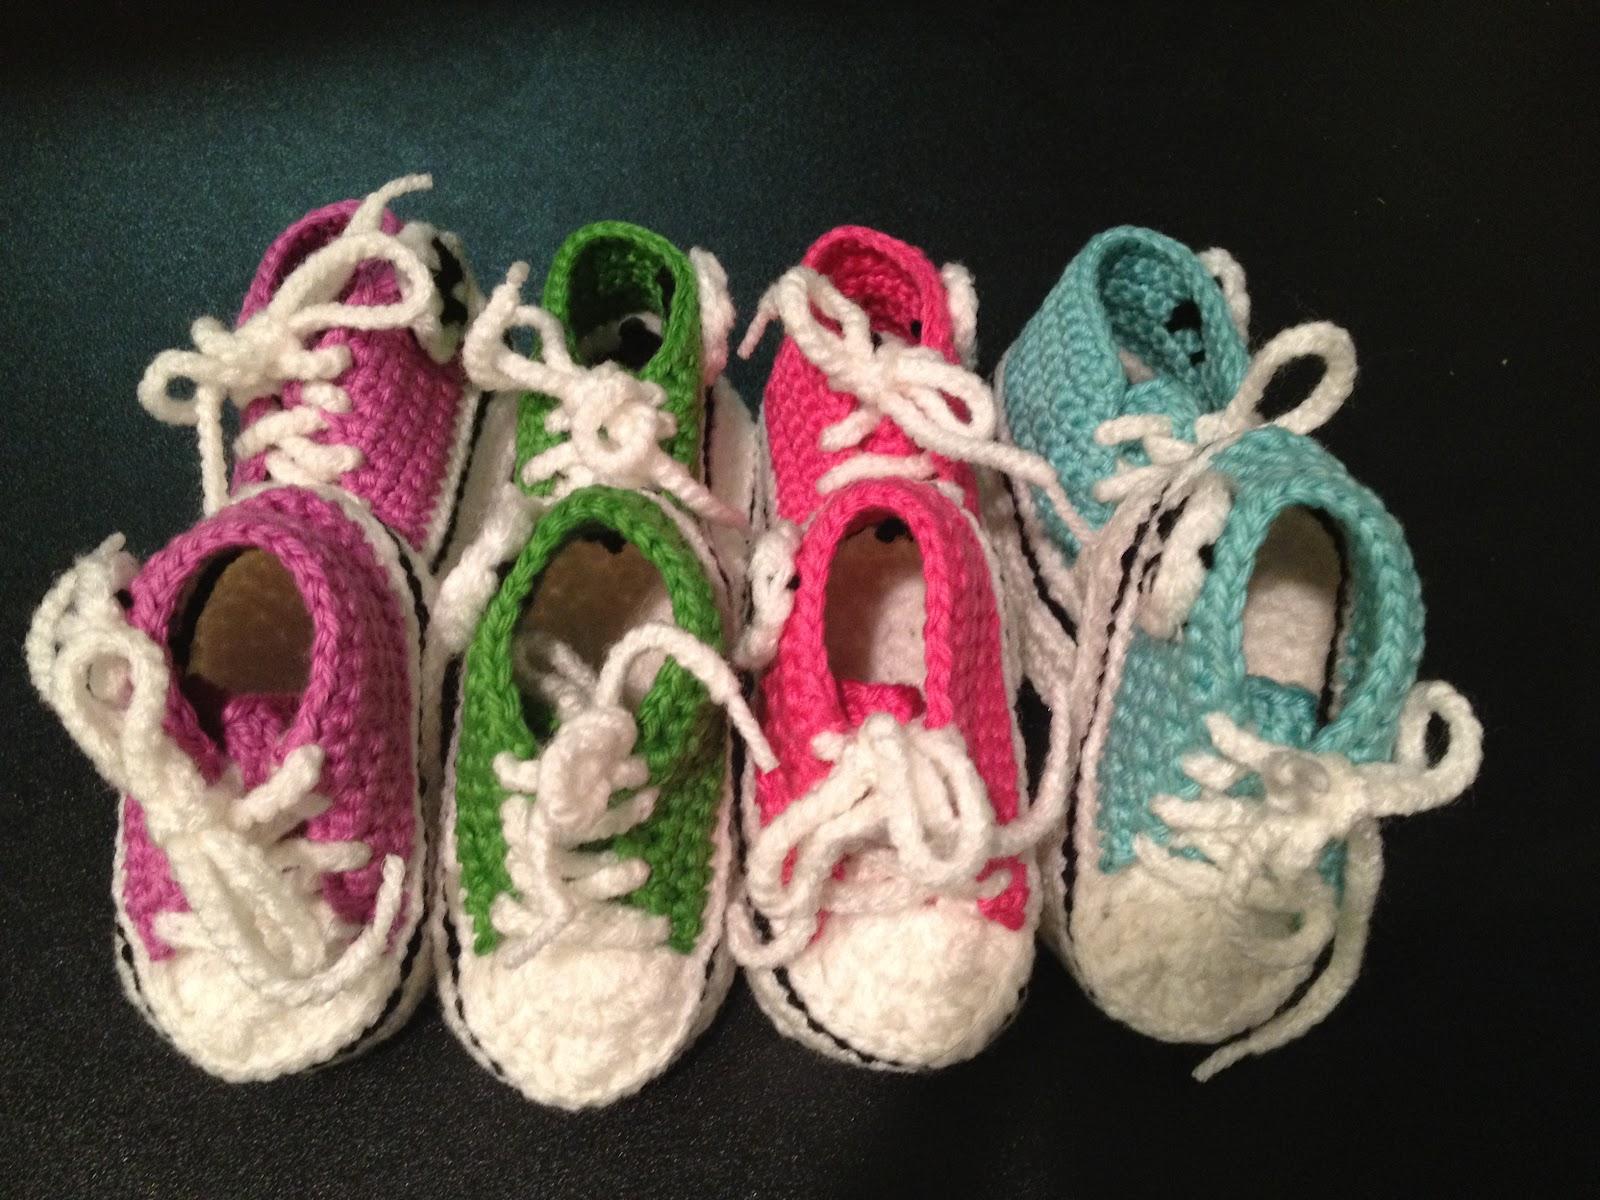 Grannys Creative Creations: Crochet Baby Converse!